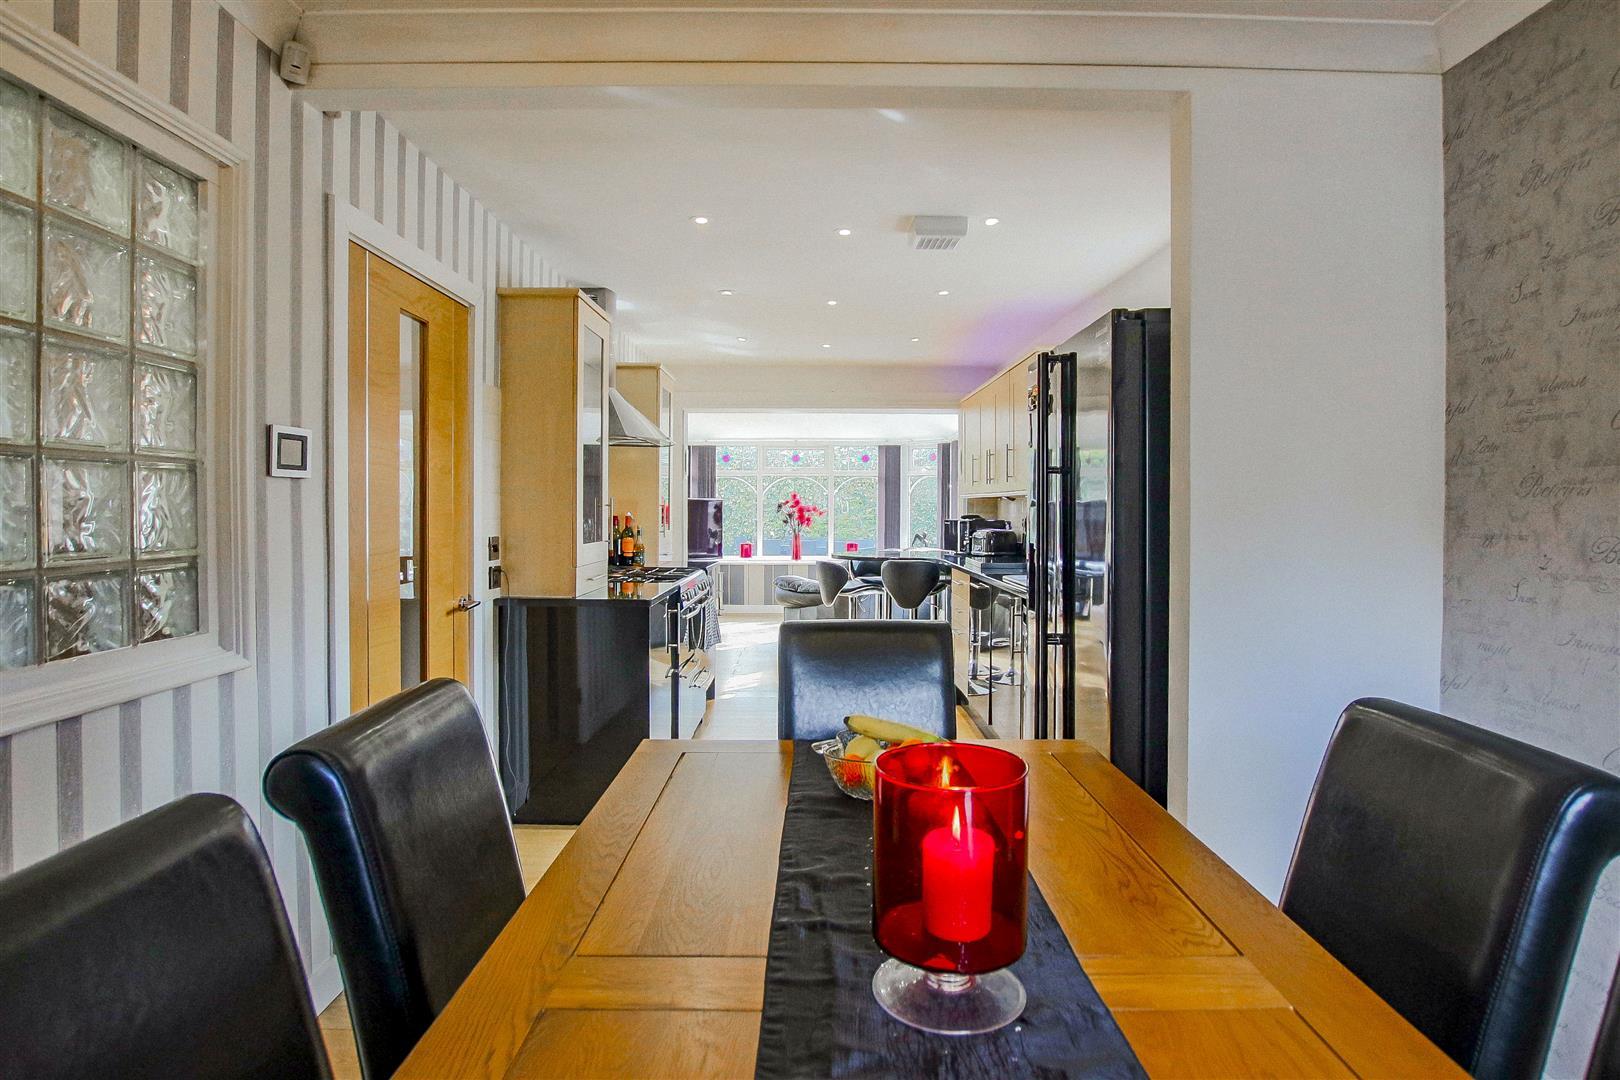 4 Bedroom Detached House For Sale - redwing31756.JPG